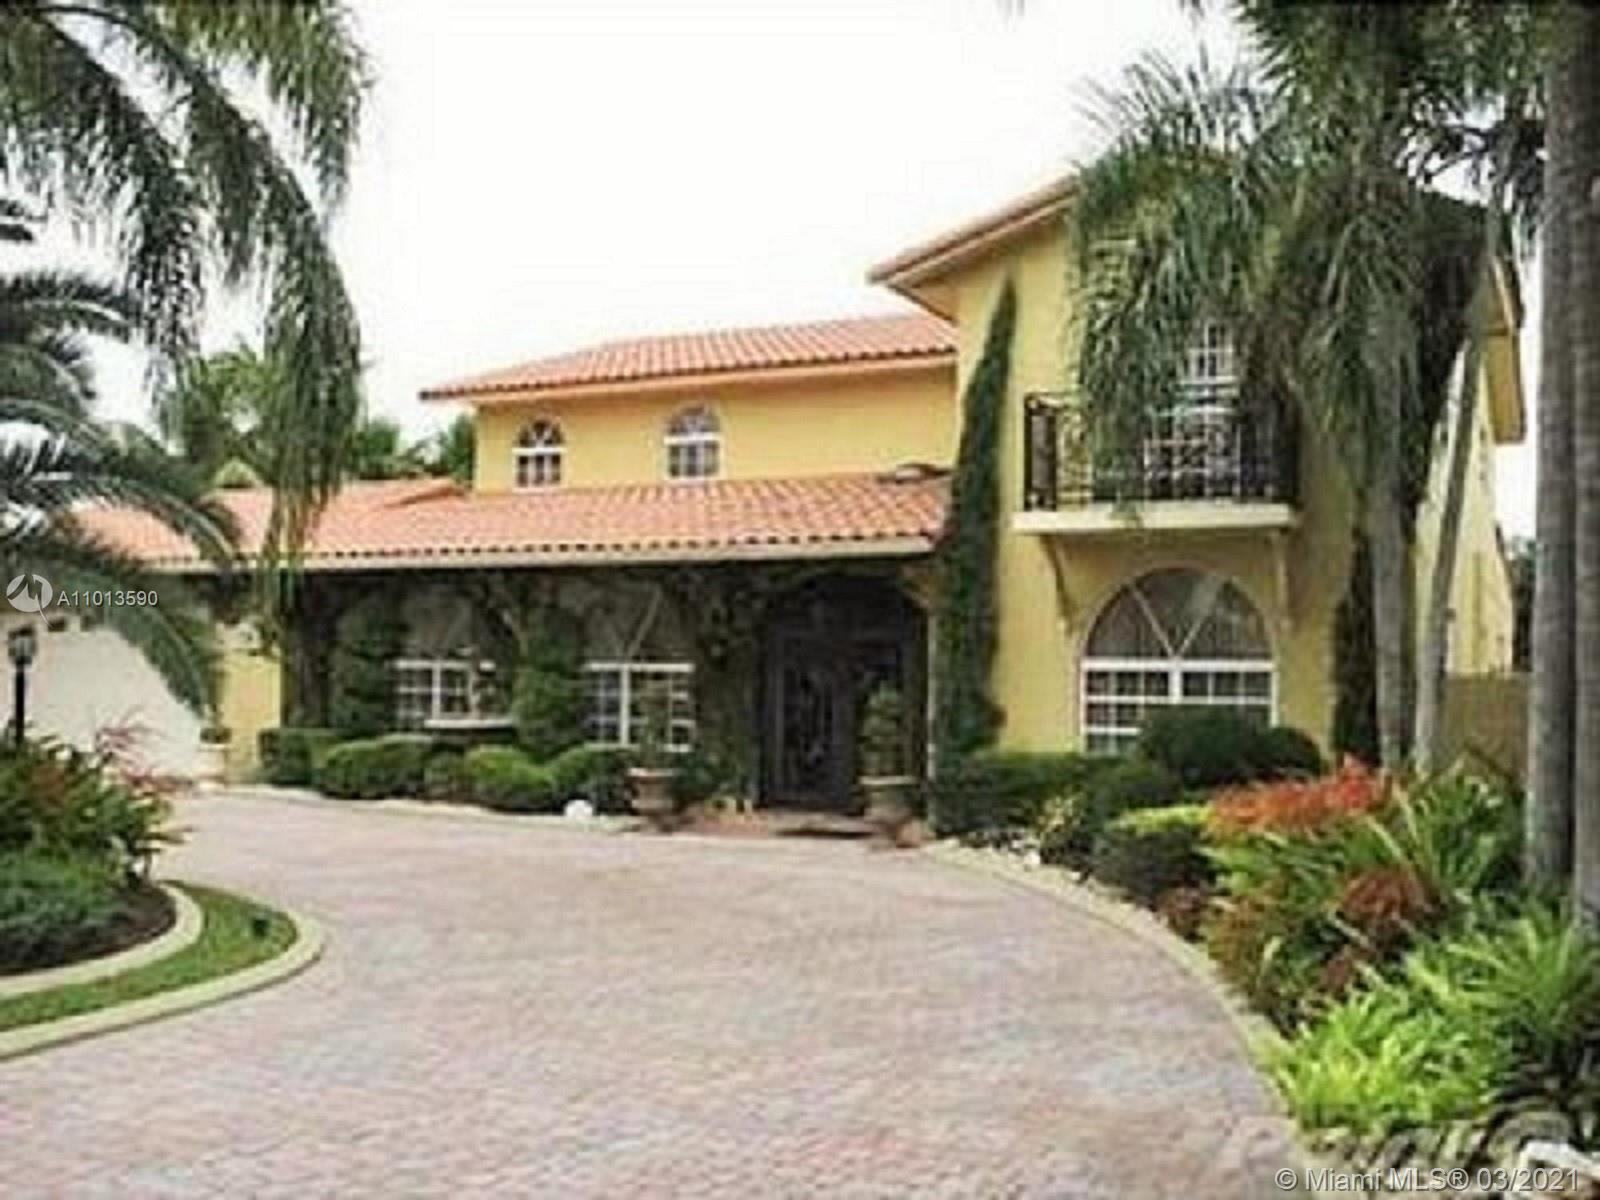 Country Club Of Miam - 7235 N OAKMONT DR, Hialeah, FL 33015